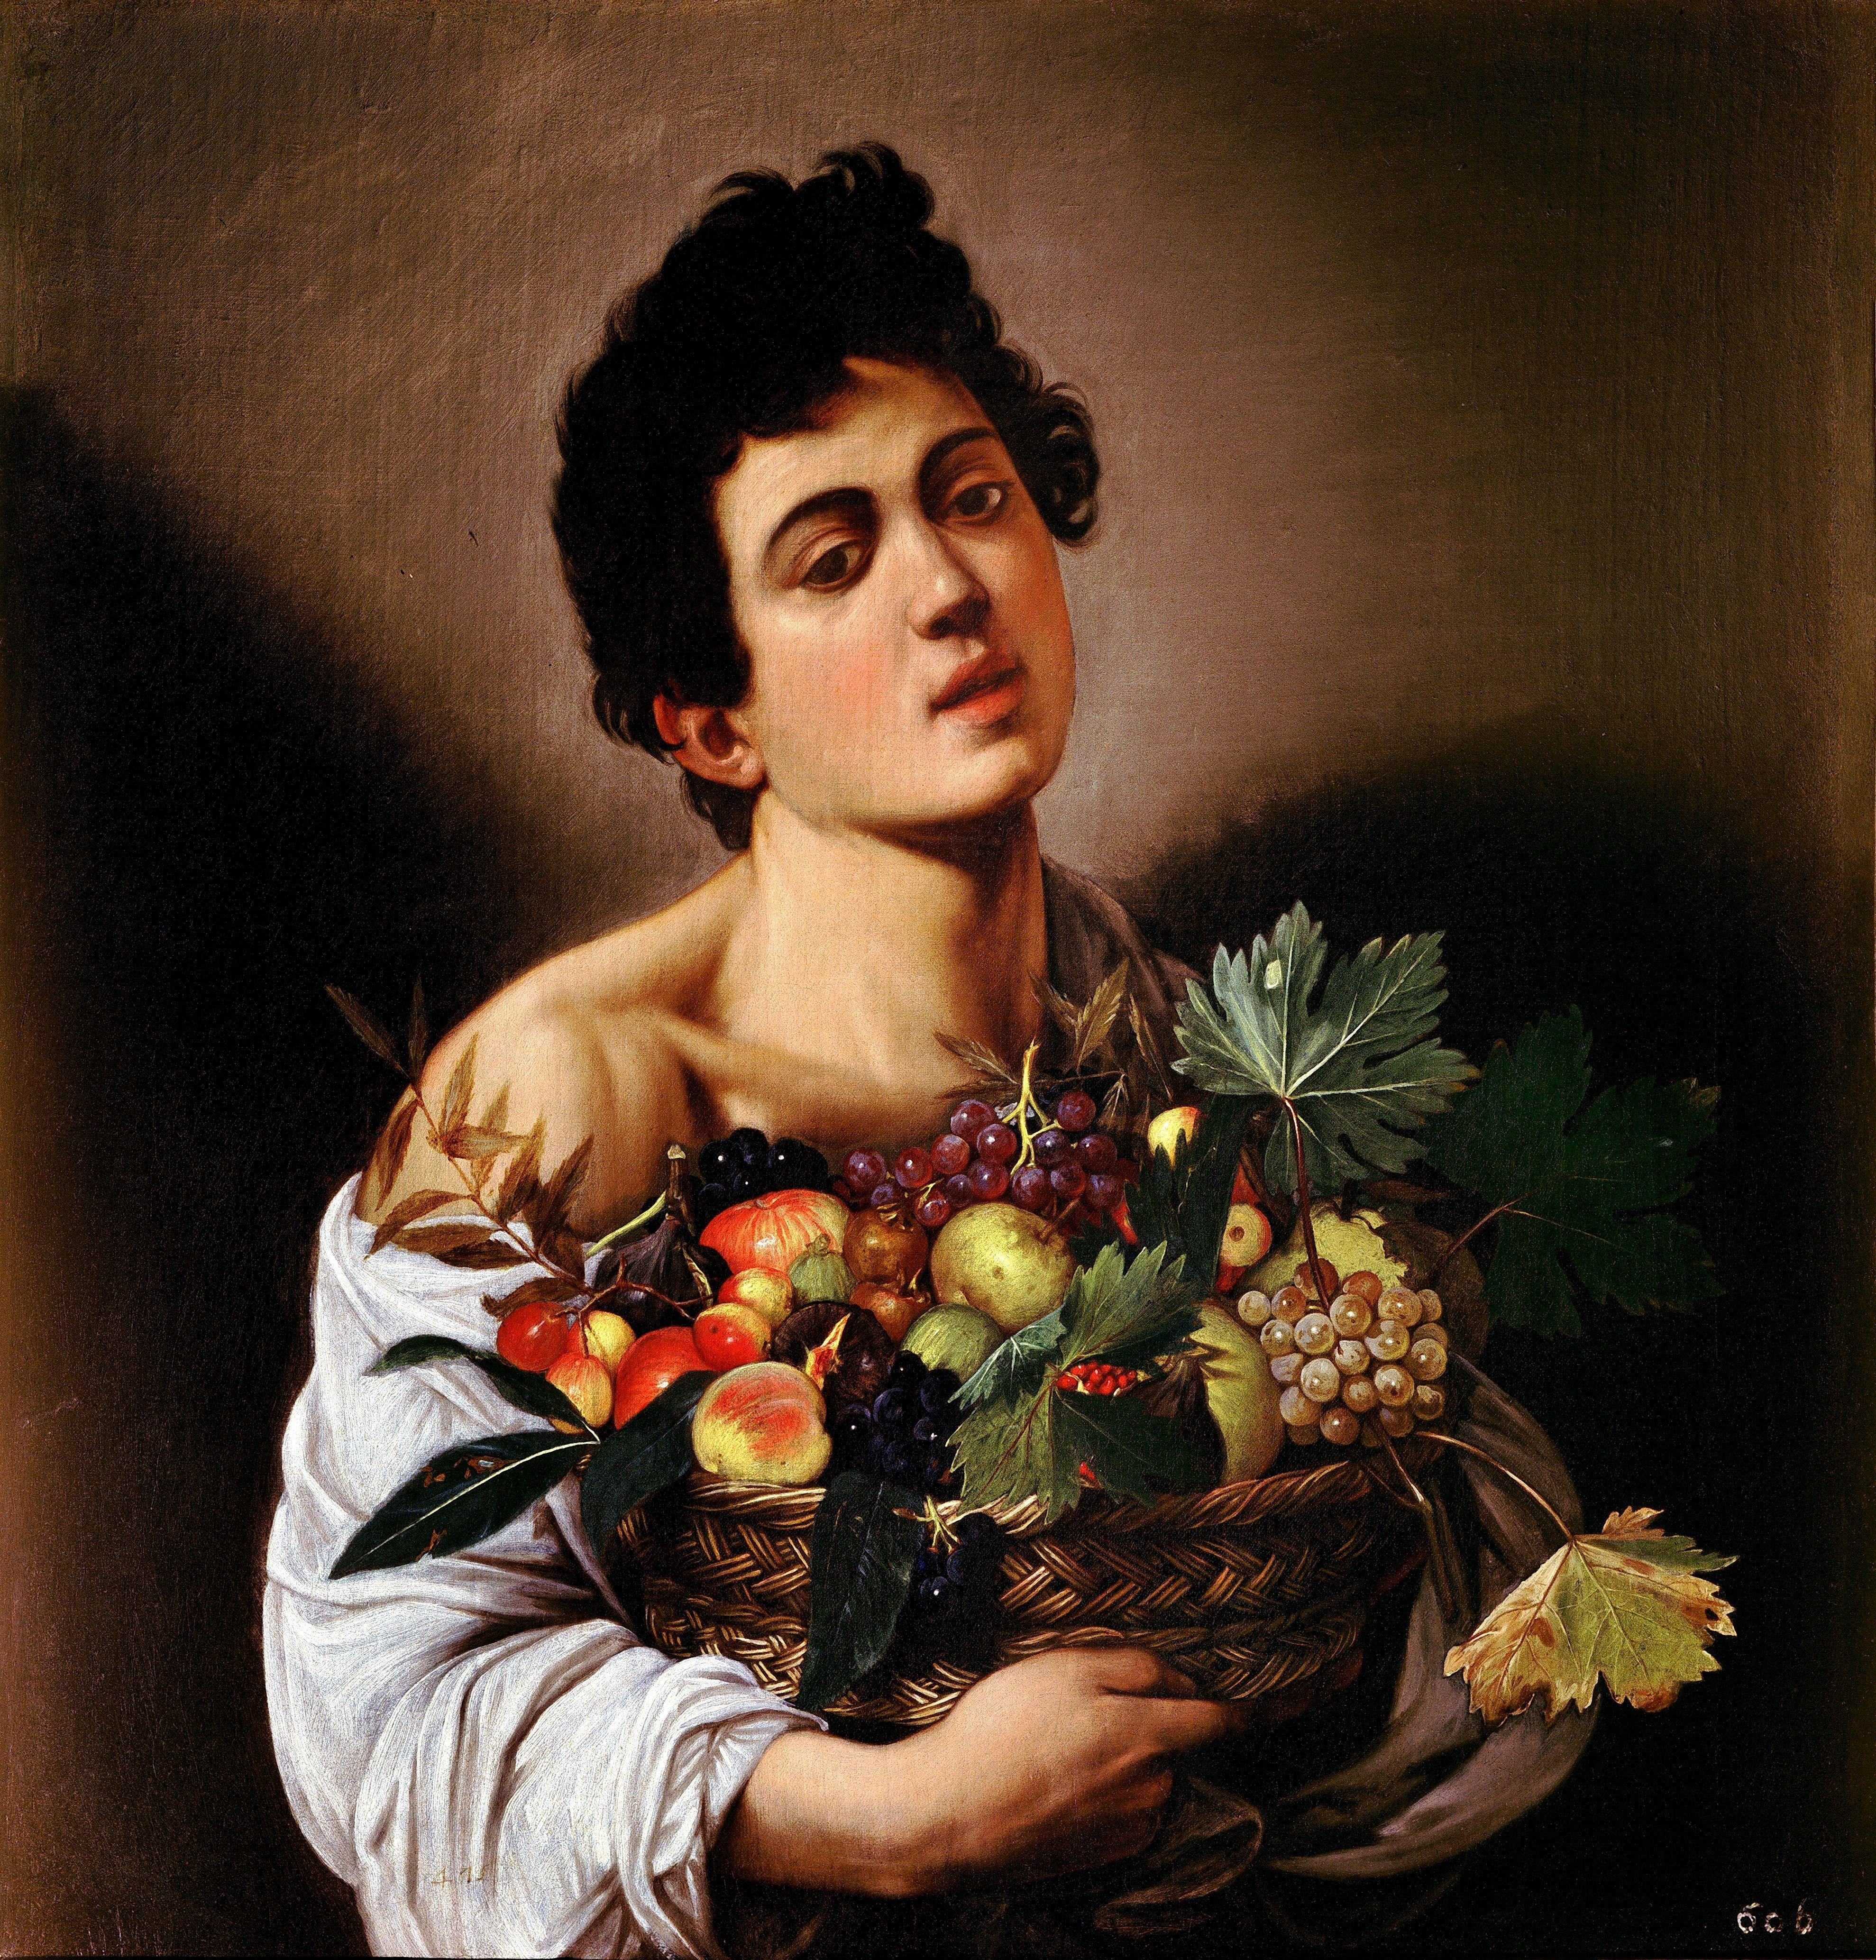 Boy_with_a_Basket_of_Fruit-Caravaggio_(1593).jpg (3957×4134)